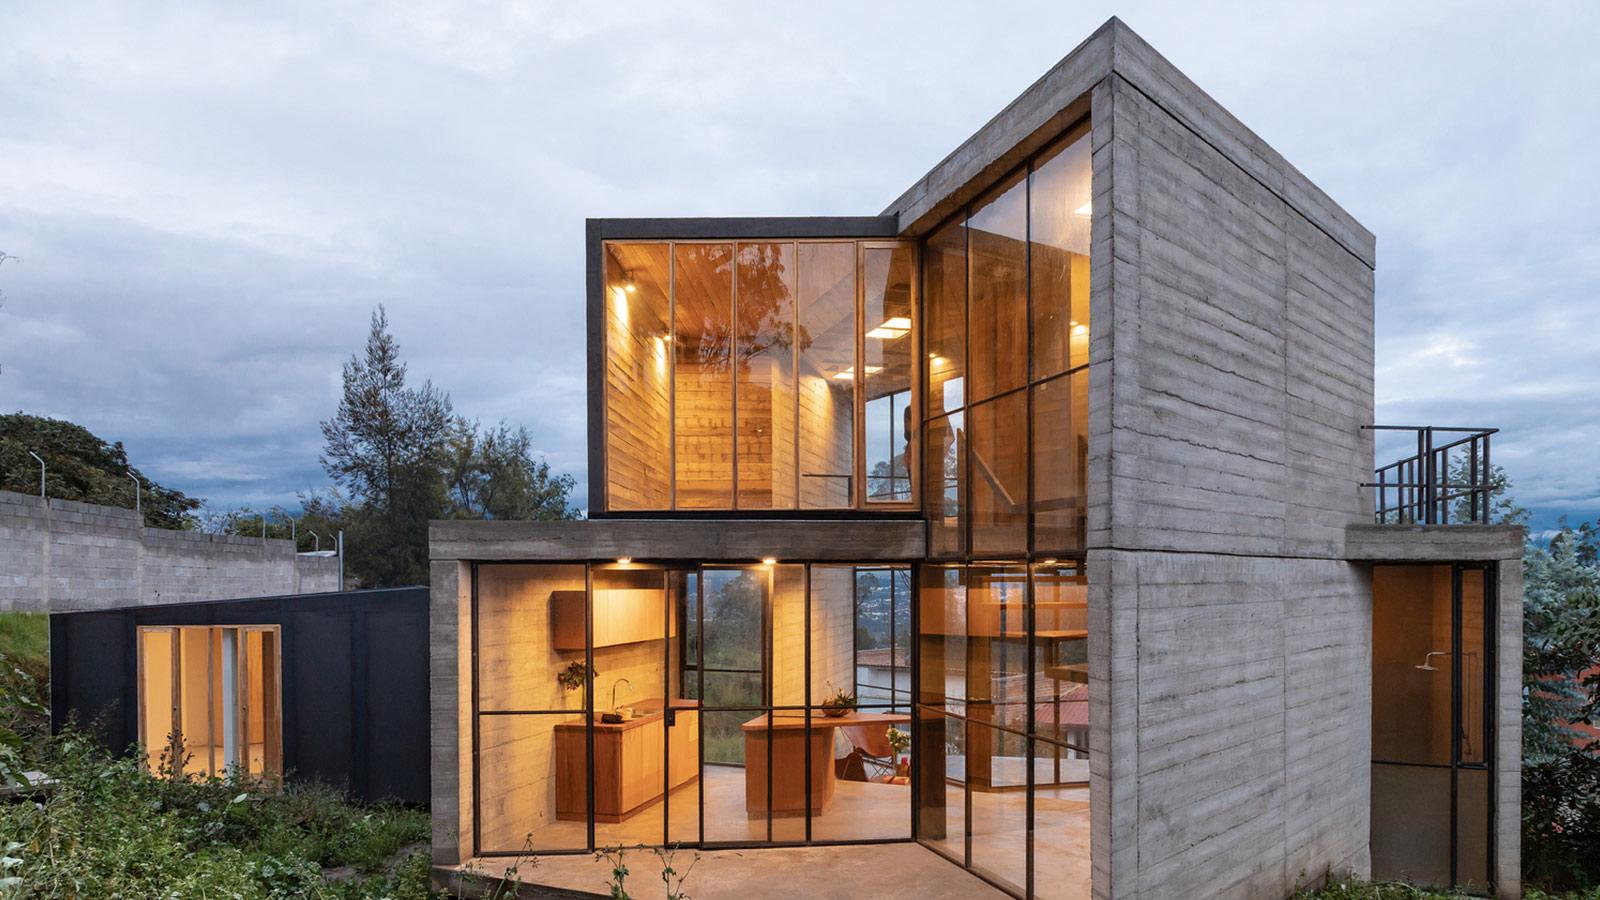 Muta House by Emilio López Arquitecto